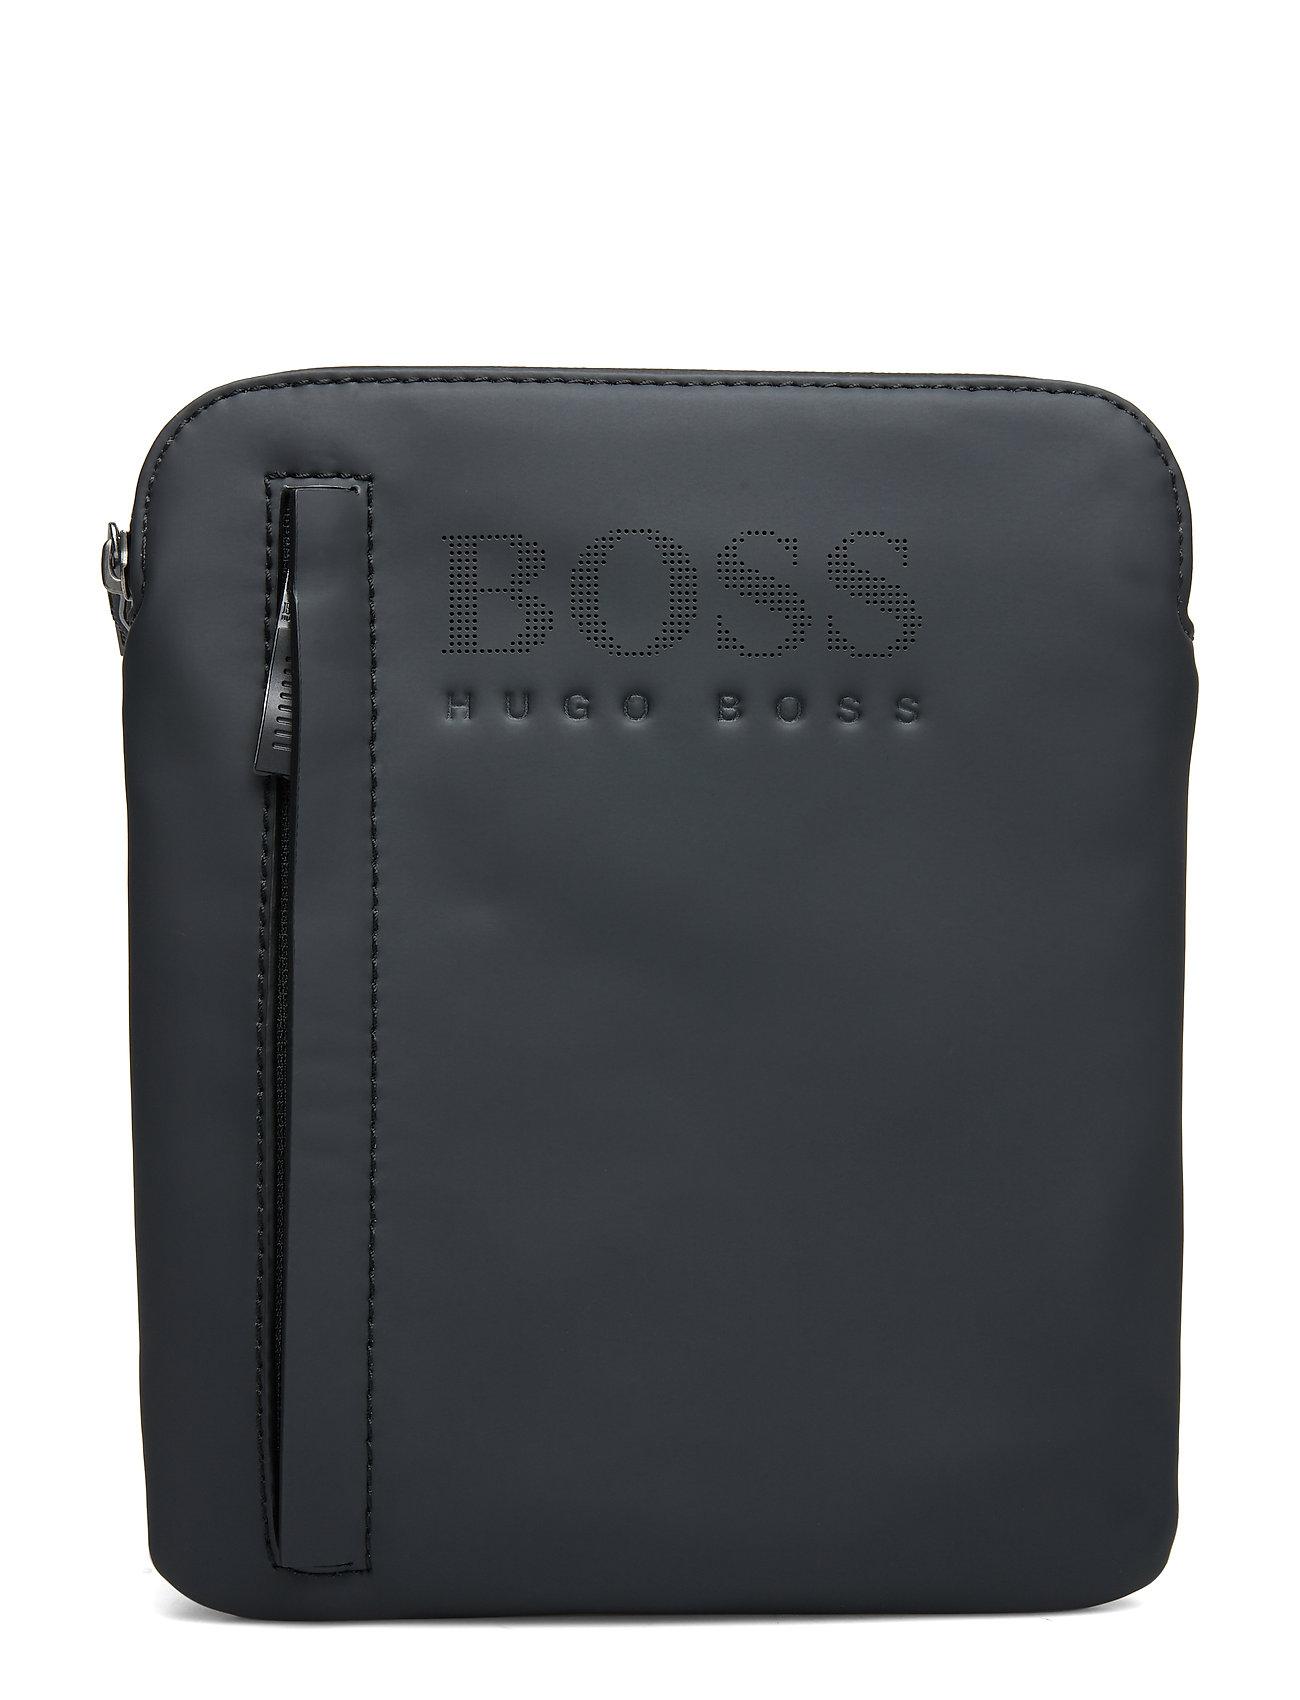 BOSS Business Hyper_S zip env - BLACK